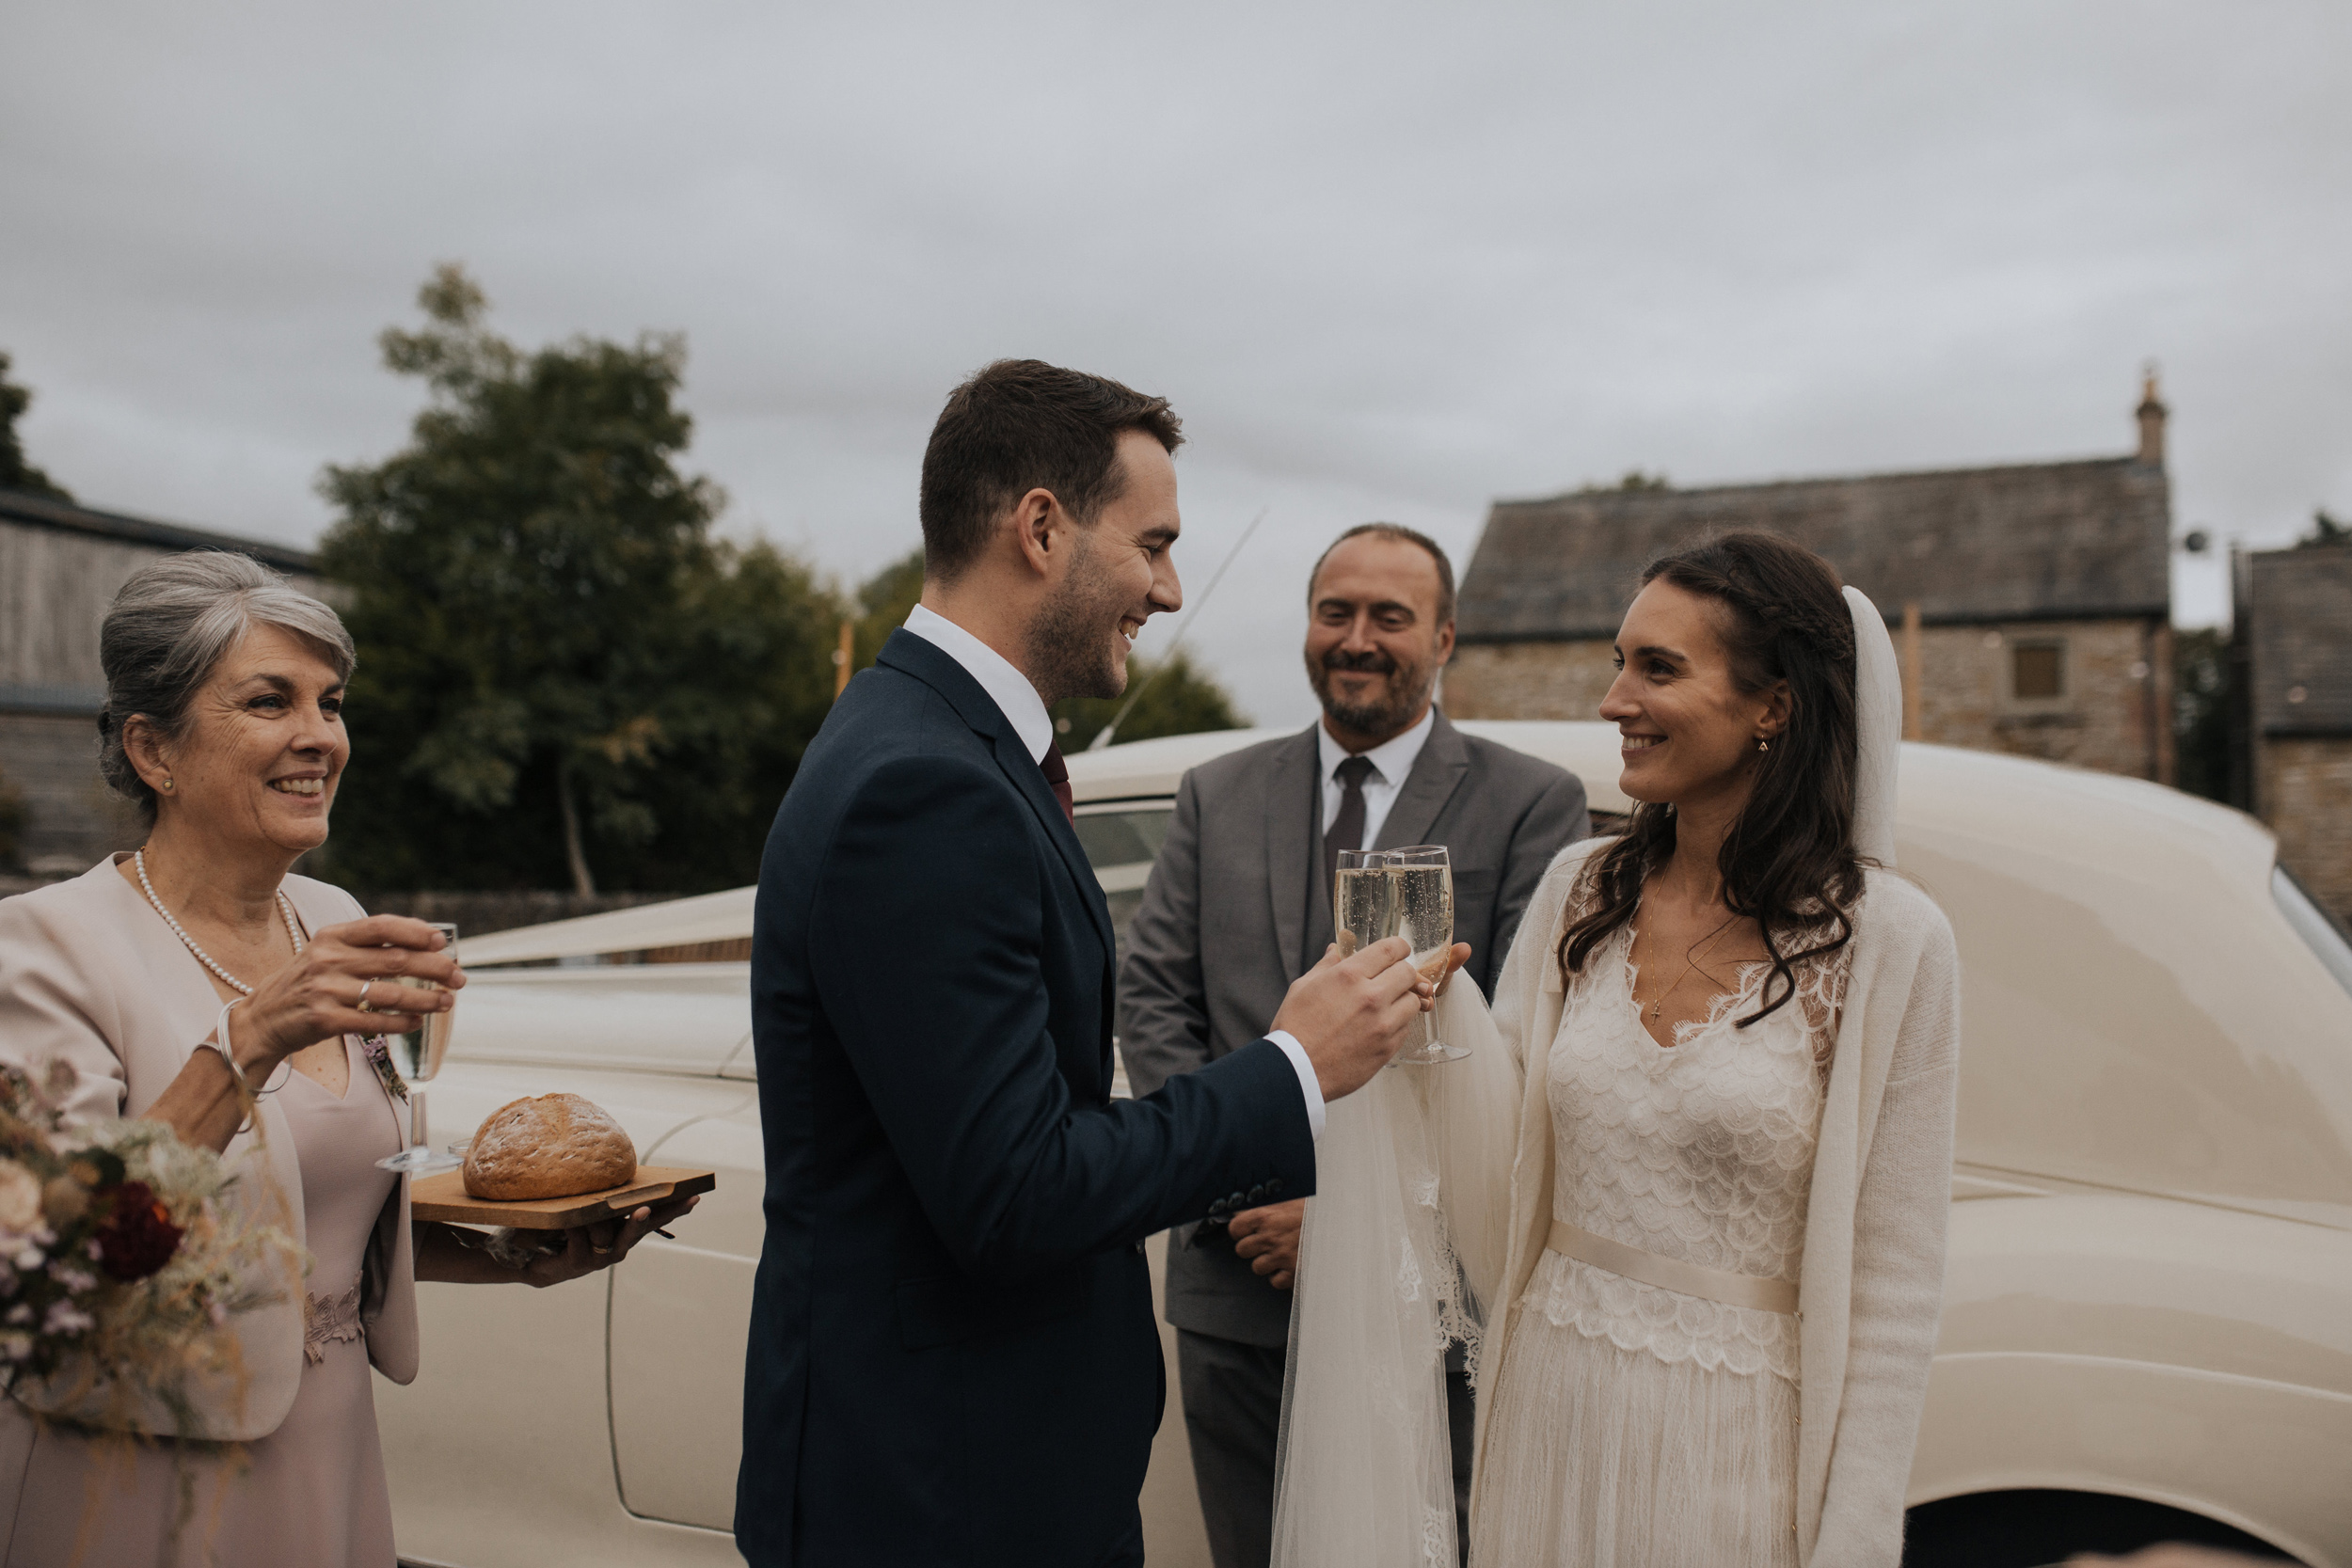 Joasia-Kate-Beaumont-Bohemian-Lace-Wedding-Dress-Peak-District-Sheffield-Wedding-46.jpg